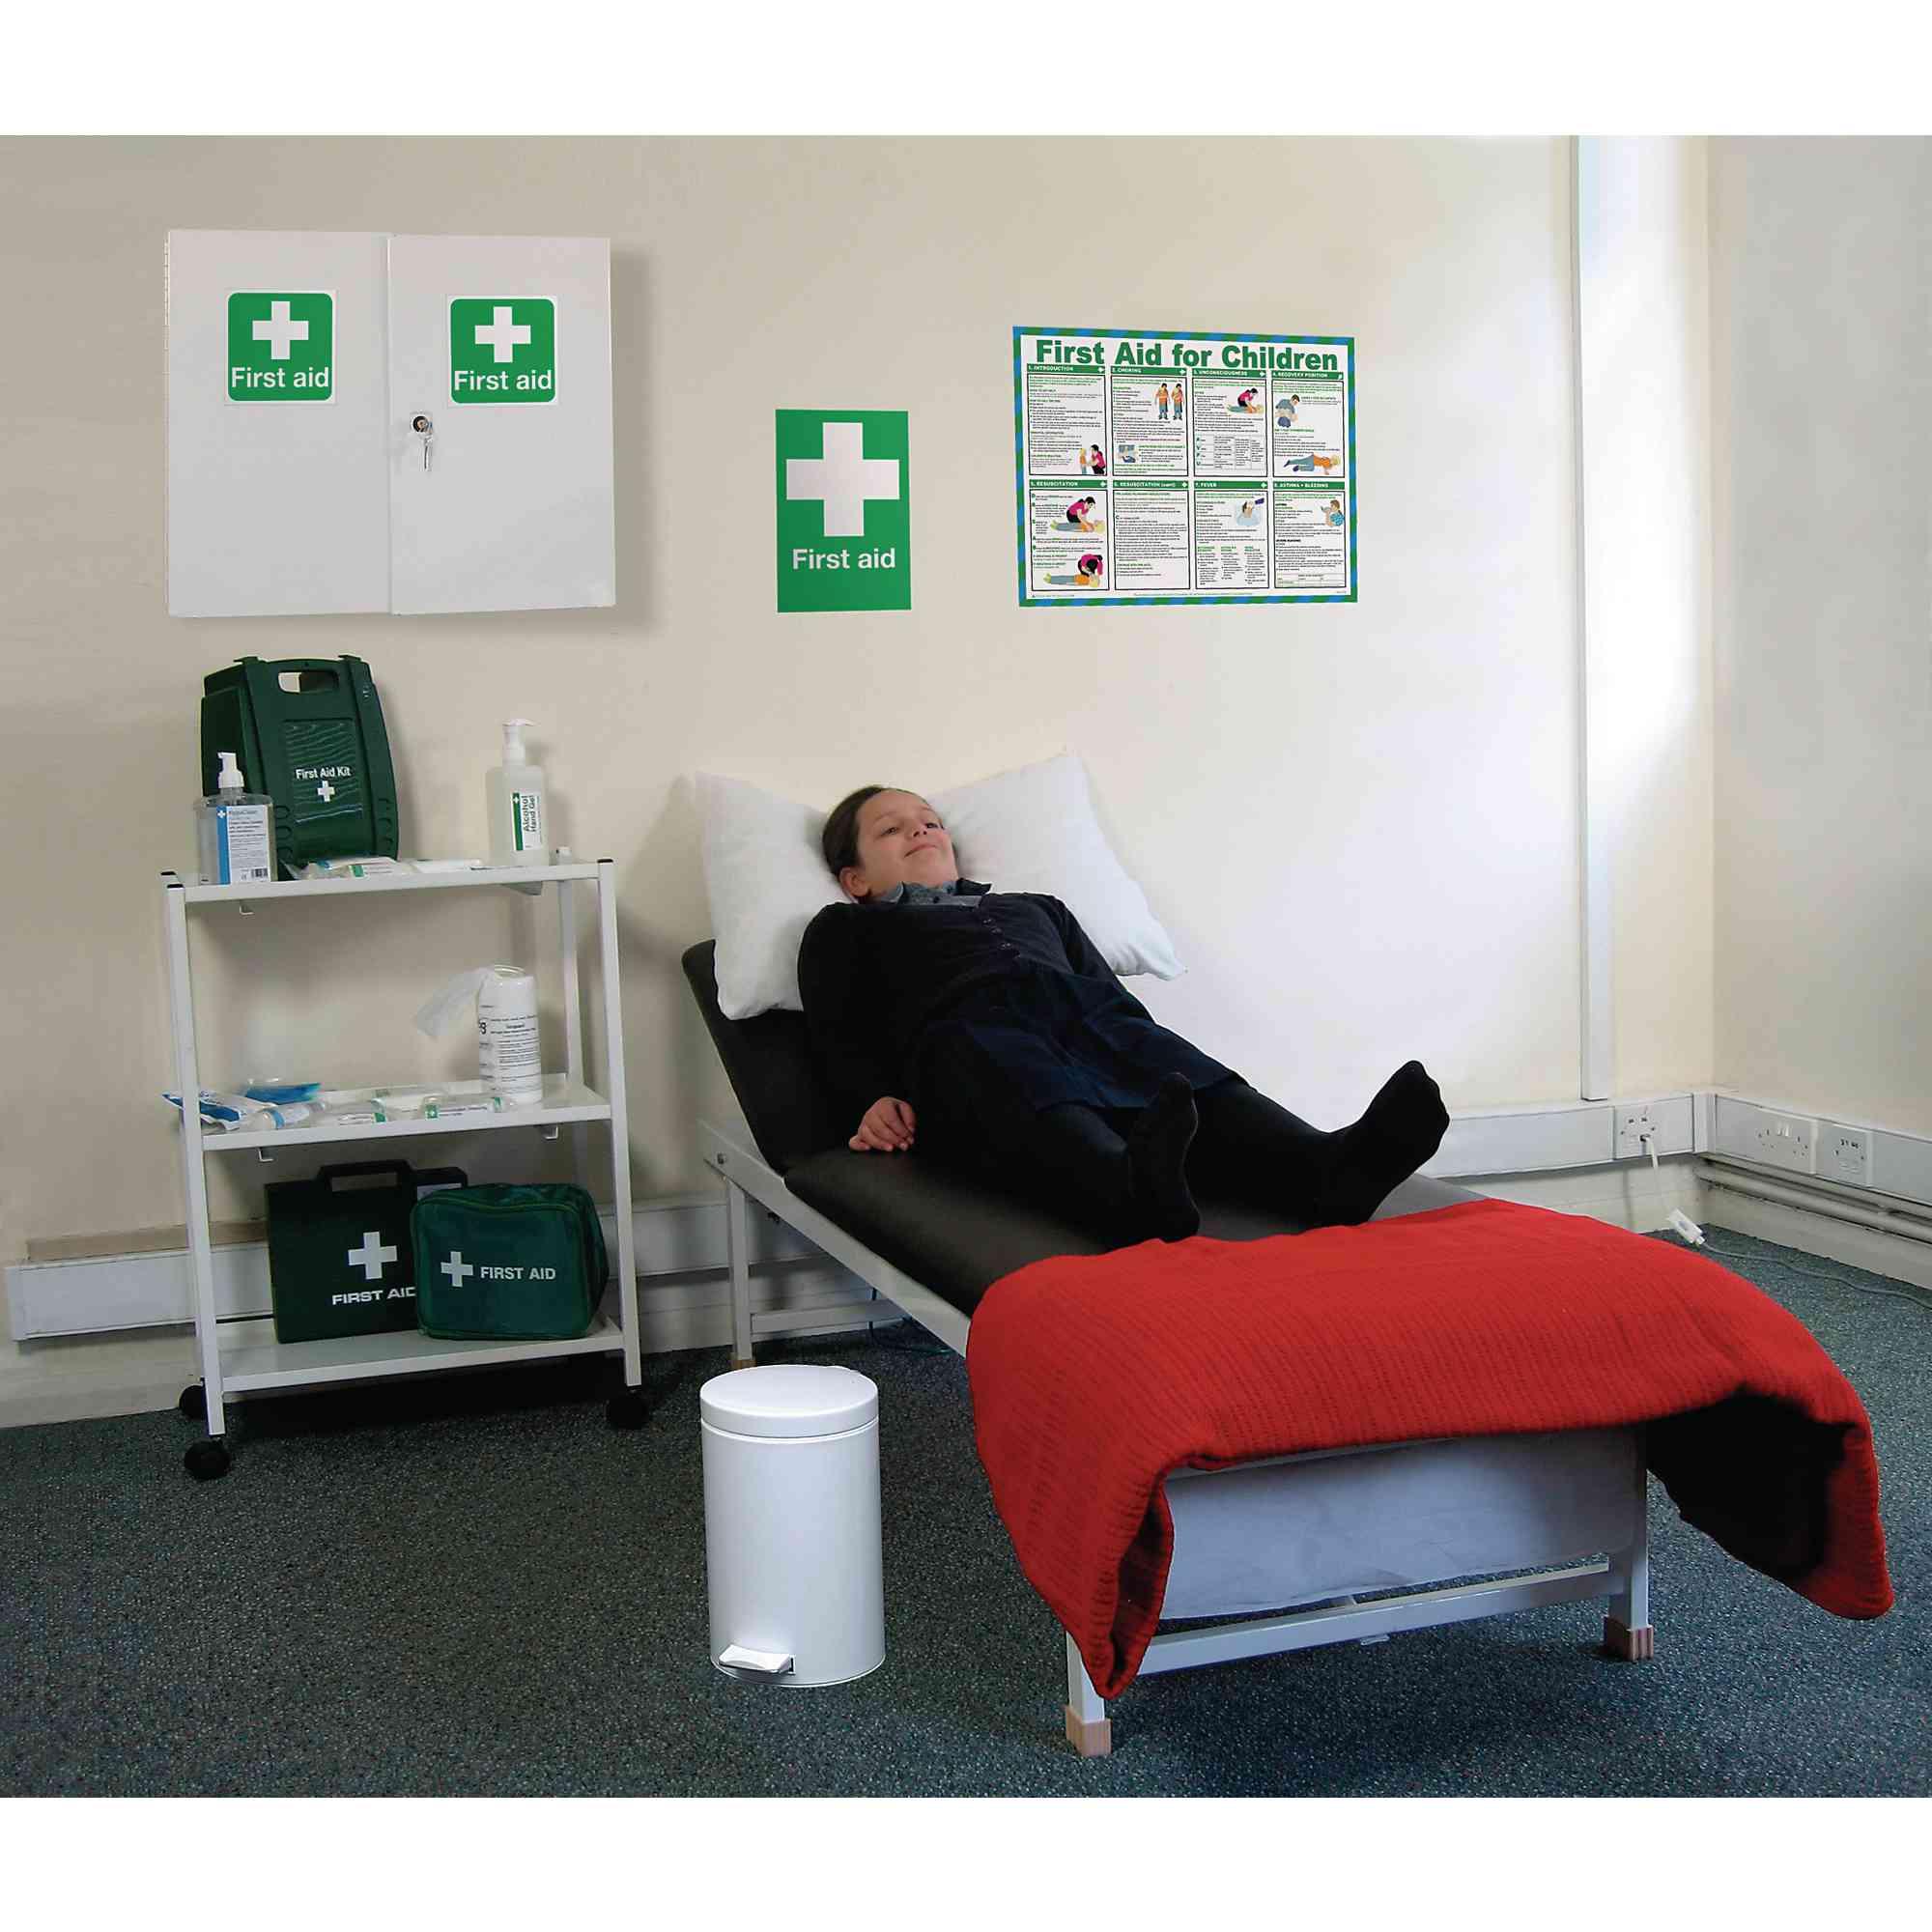 School First Aid Room Gls Educational Supplies